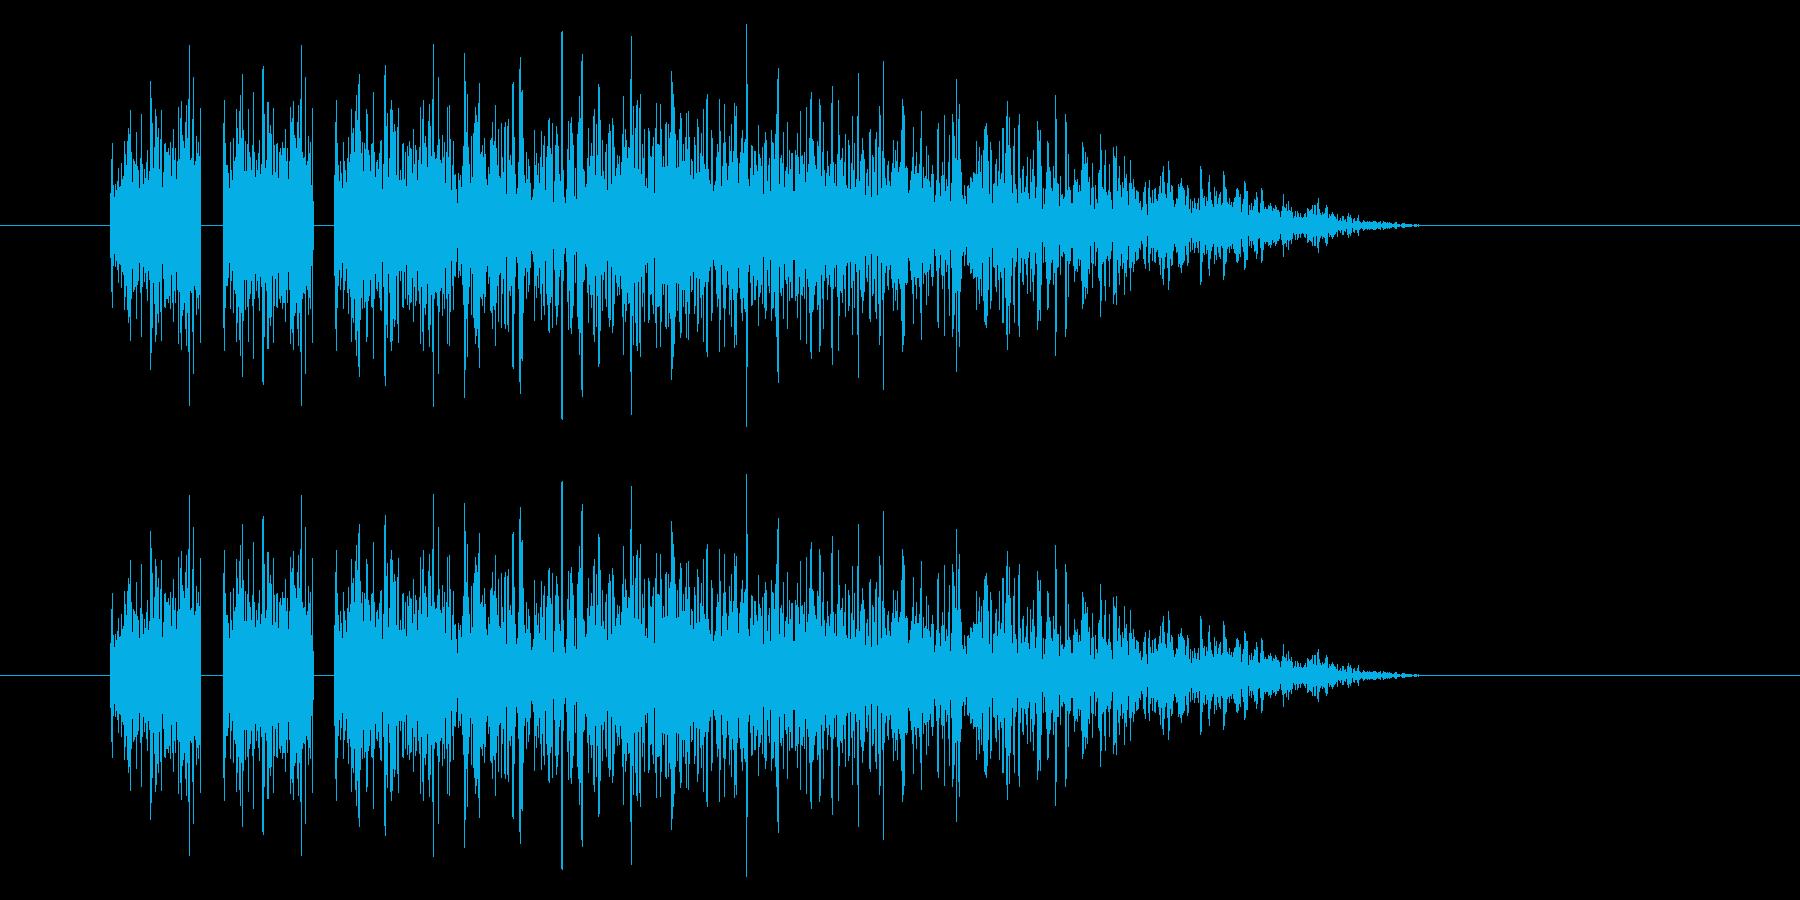 SNES-RPG04-03(魔法 炎2)の再生済みの波形